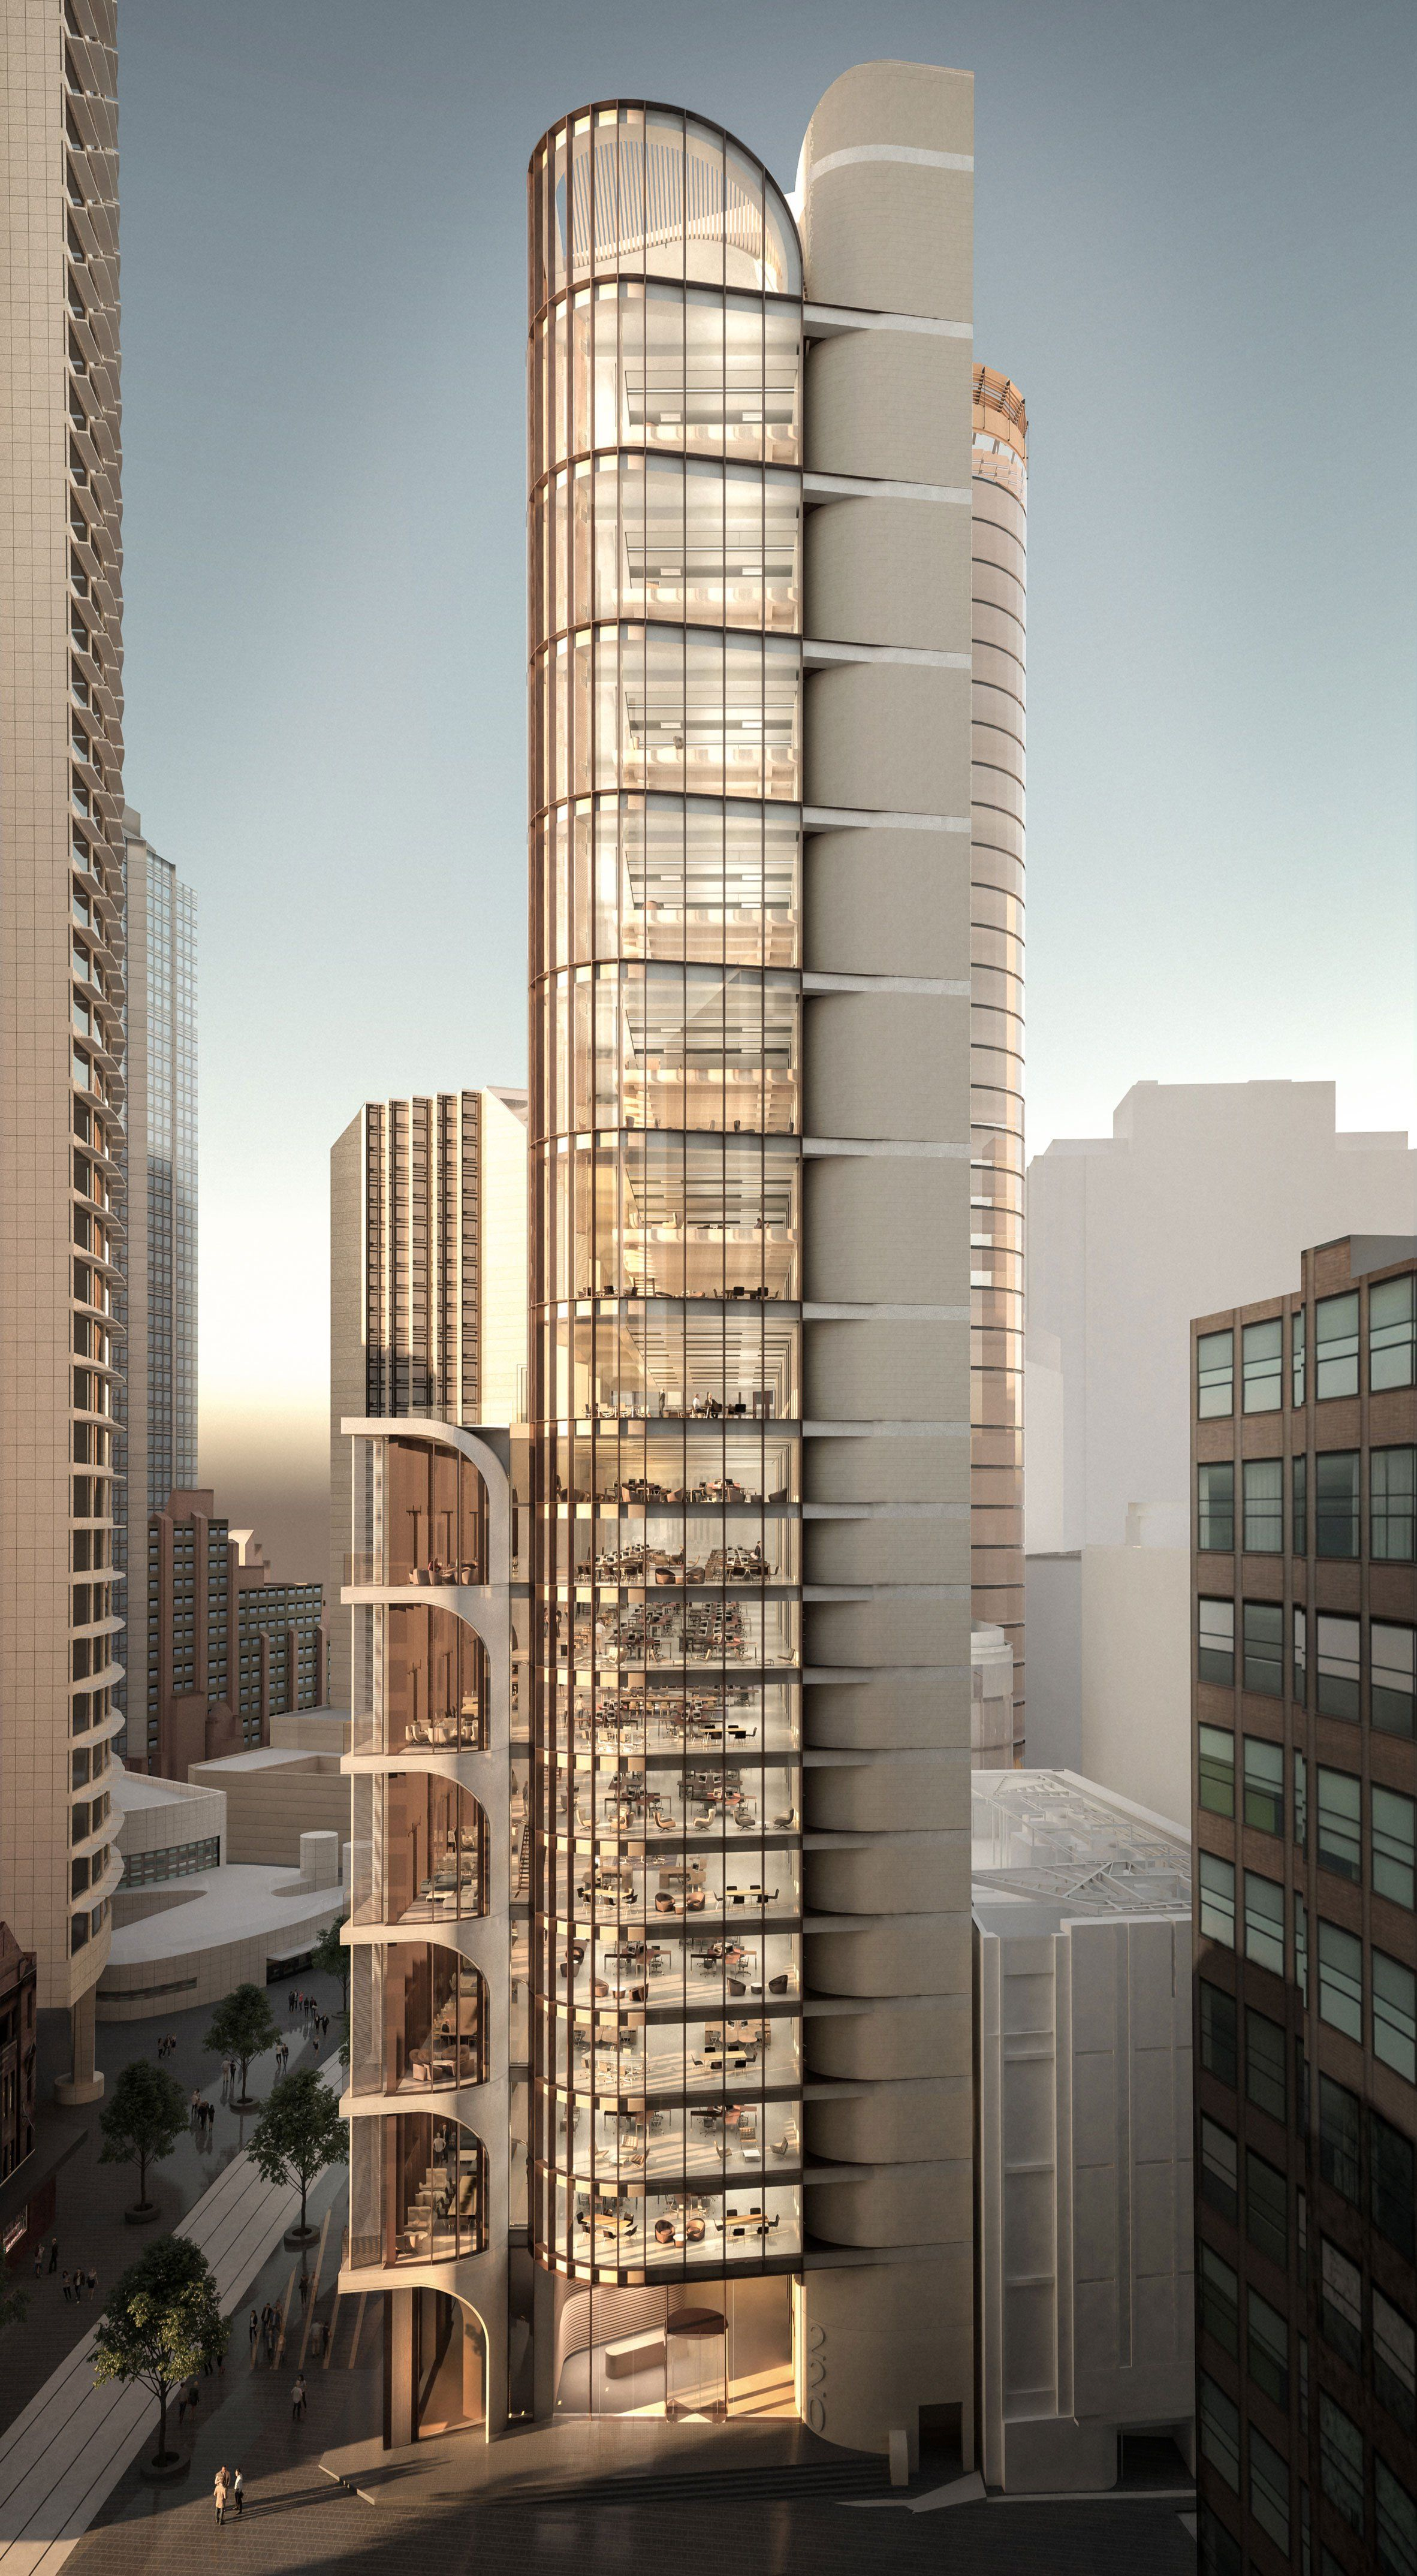 International Architecture Firm Grimshaw Wins Design Competition for Sydney  CBD Development